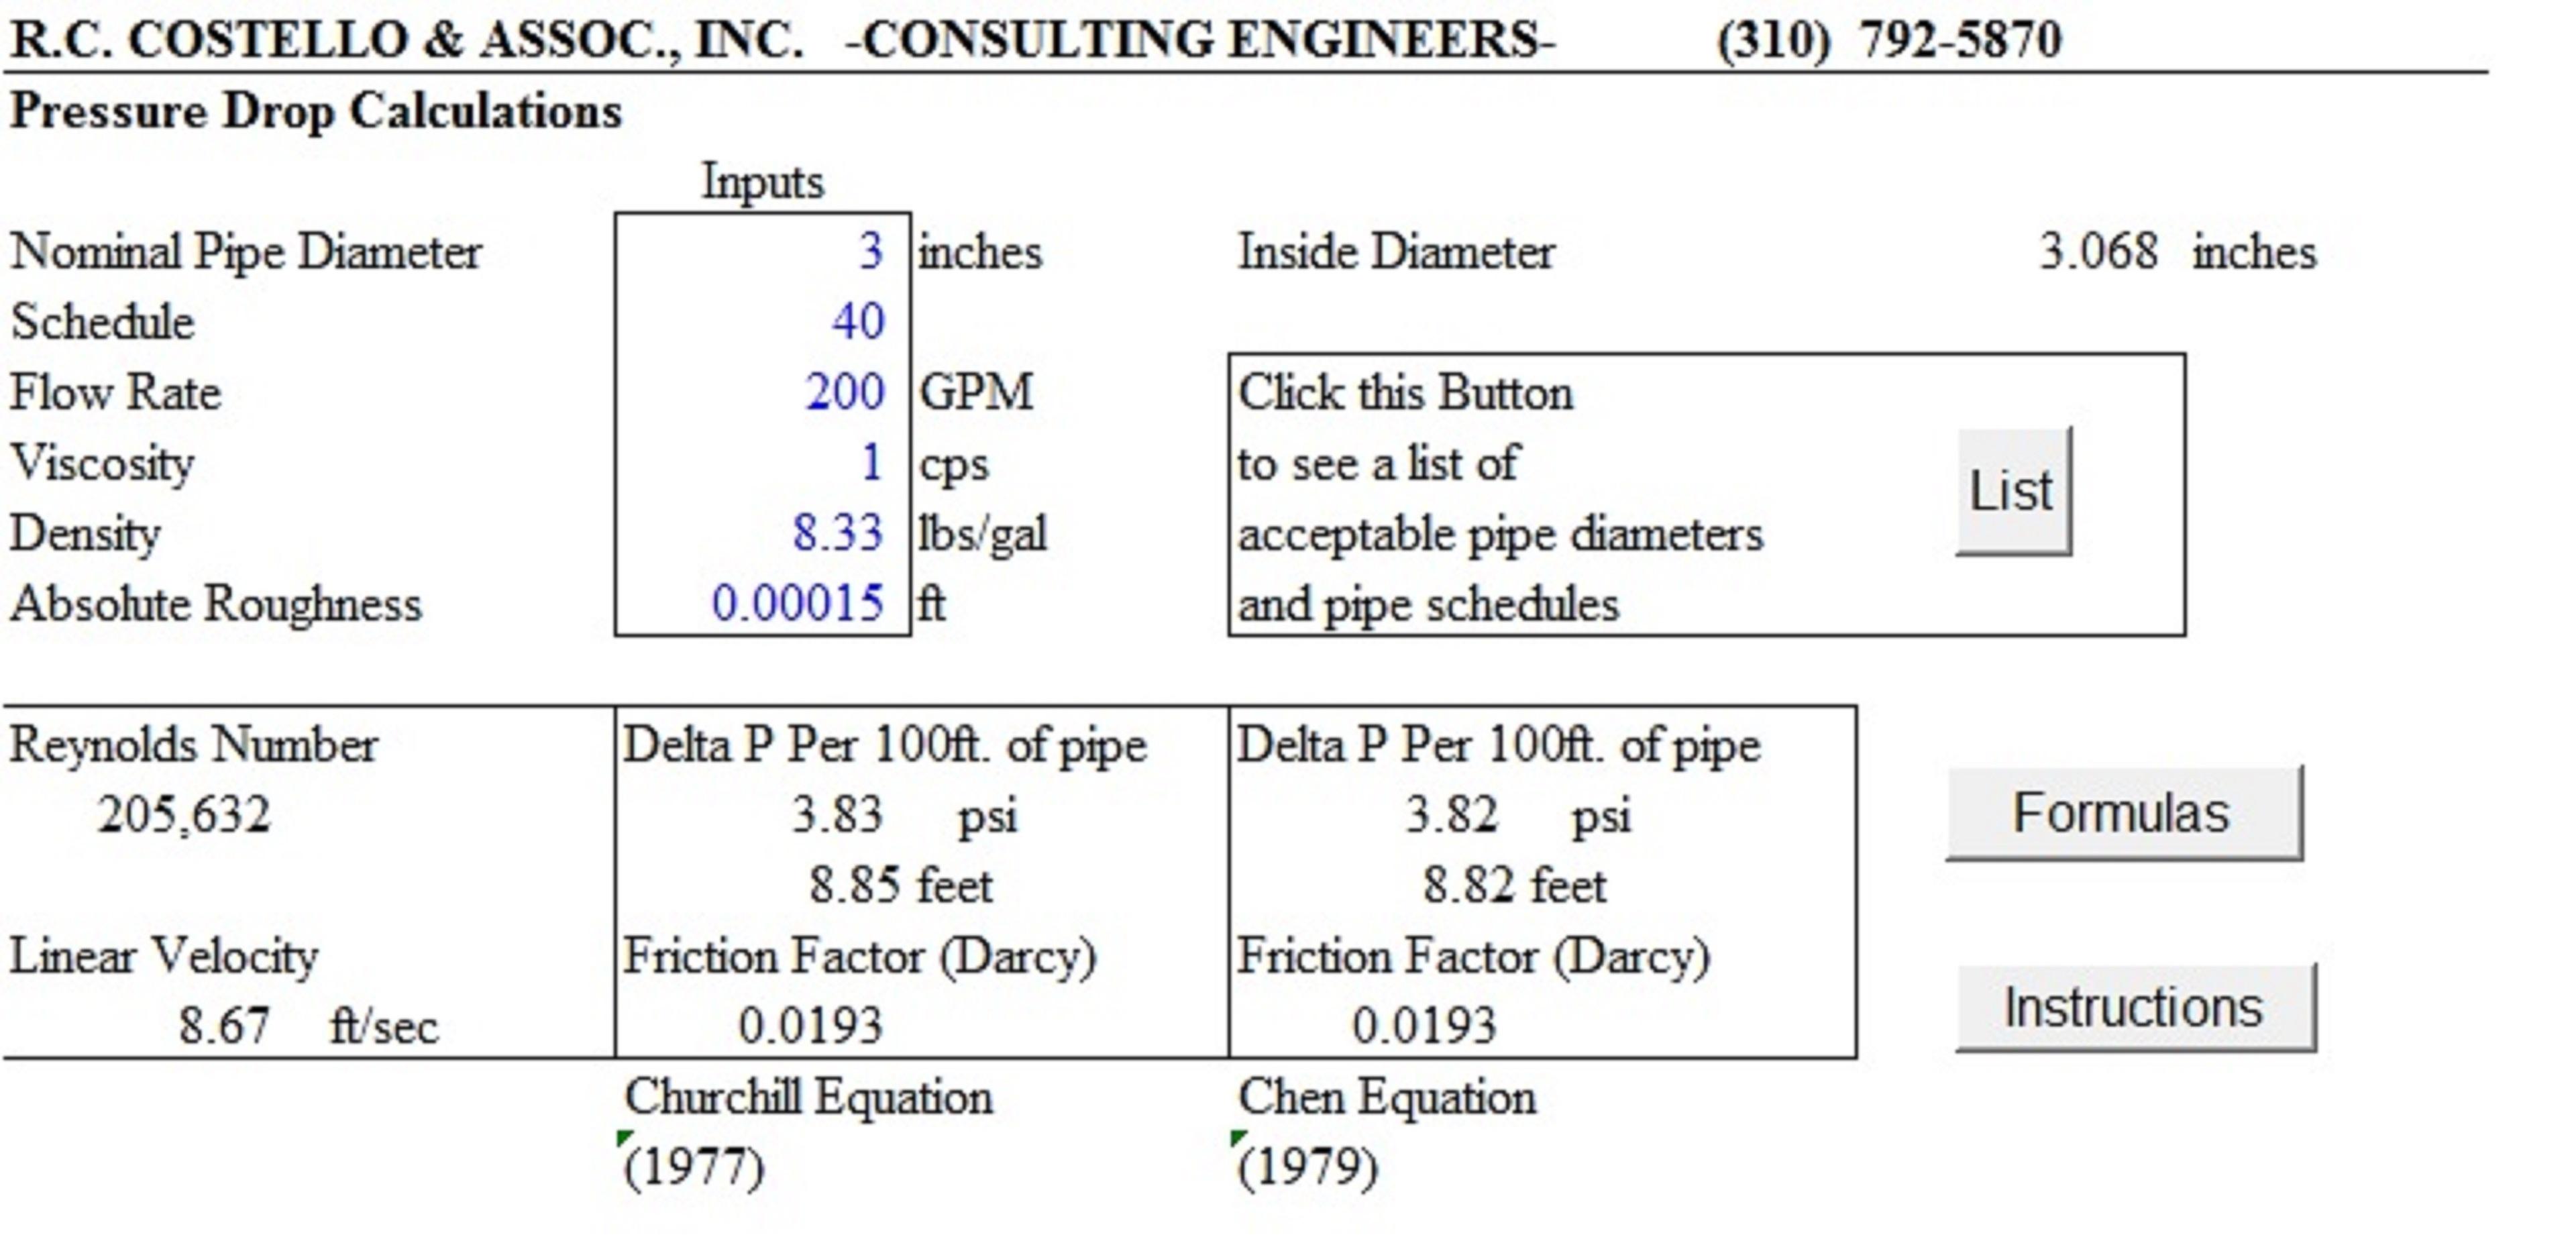 Pipe Heat Loss Spreadsheet In Pipeflow 3.0  A Pressure Drop Calculator – Costello